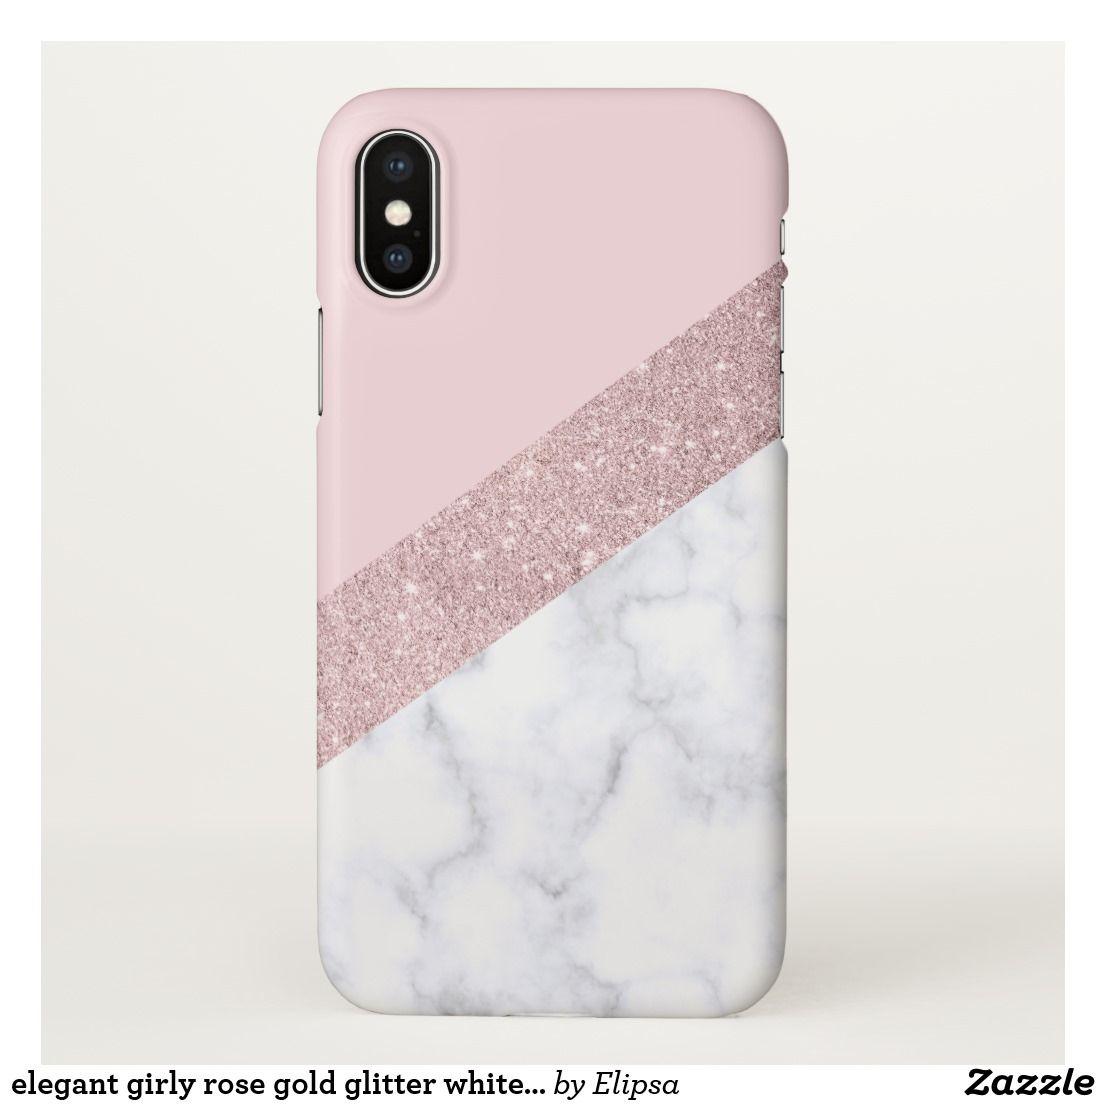 Elegant Girly Rose Gold Glitter White Marble Pink Iphone Case Zazzle Com Glitter Phone Cases Sparkly Phone Cases Sparkle Phone Case